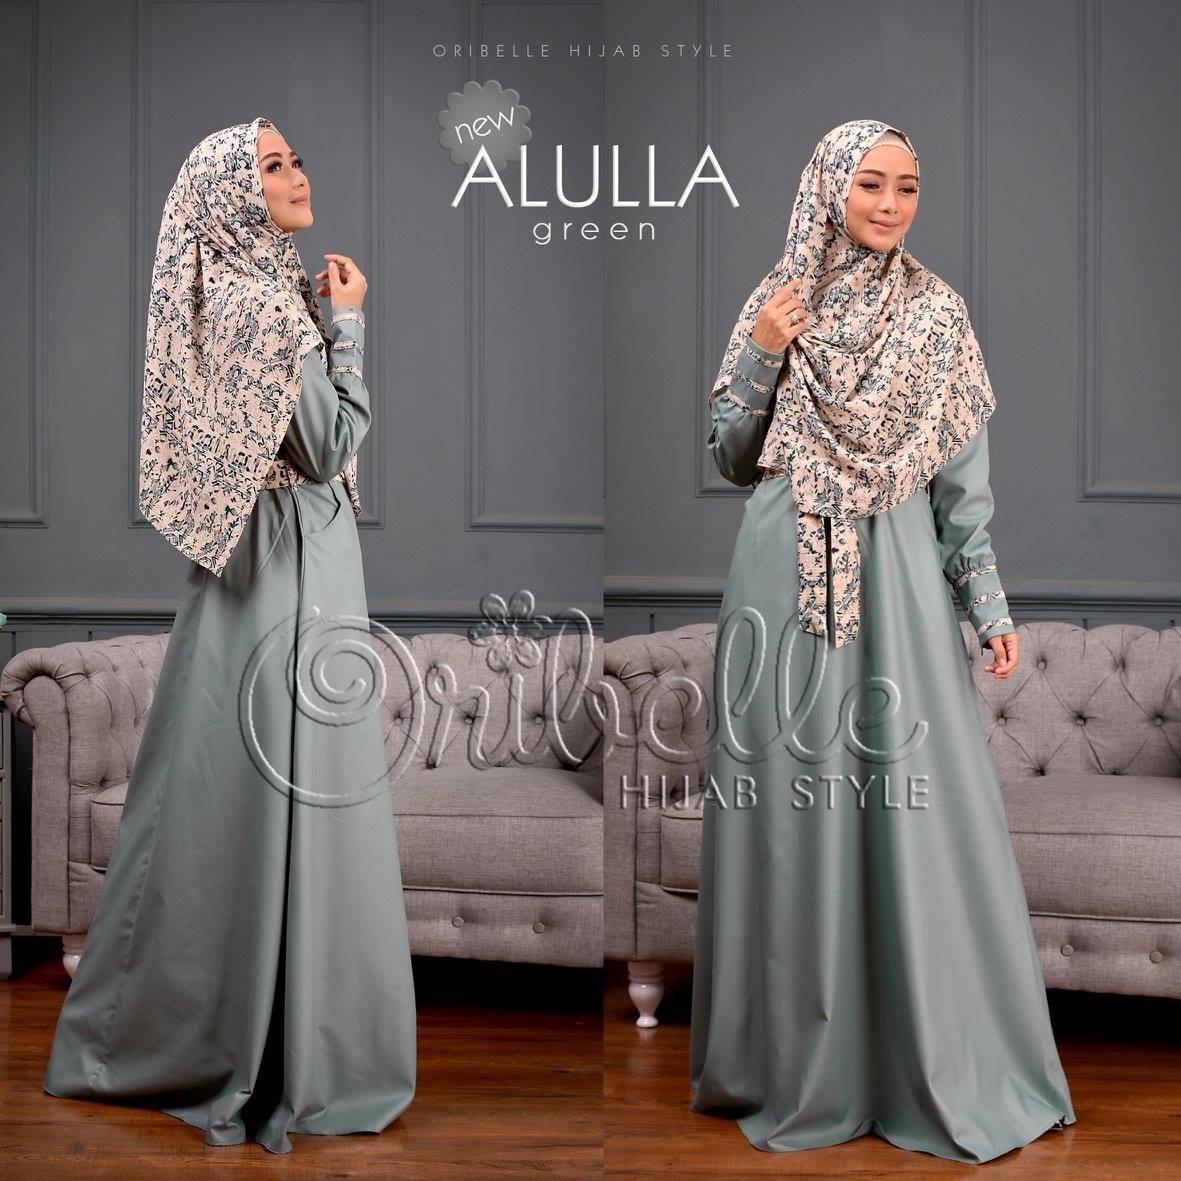 Setelan Gamis New Alulla Green Toko Online Syari Wanita 1 Baju Hijab Modern